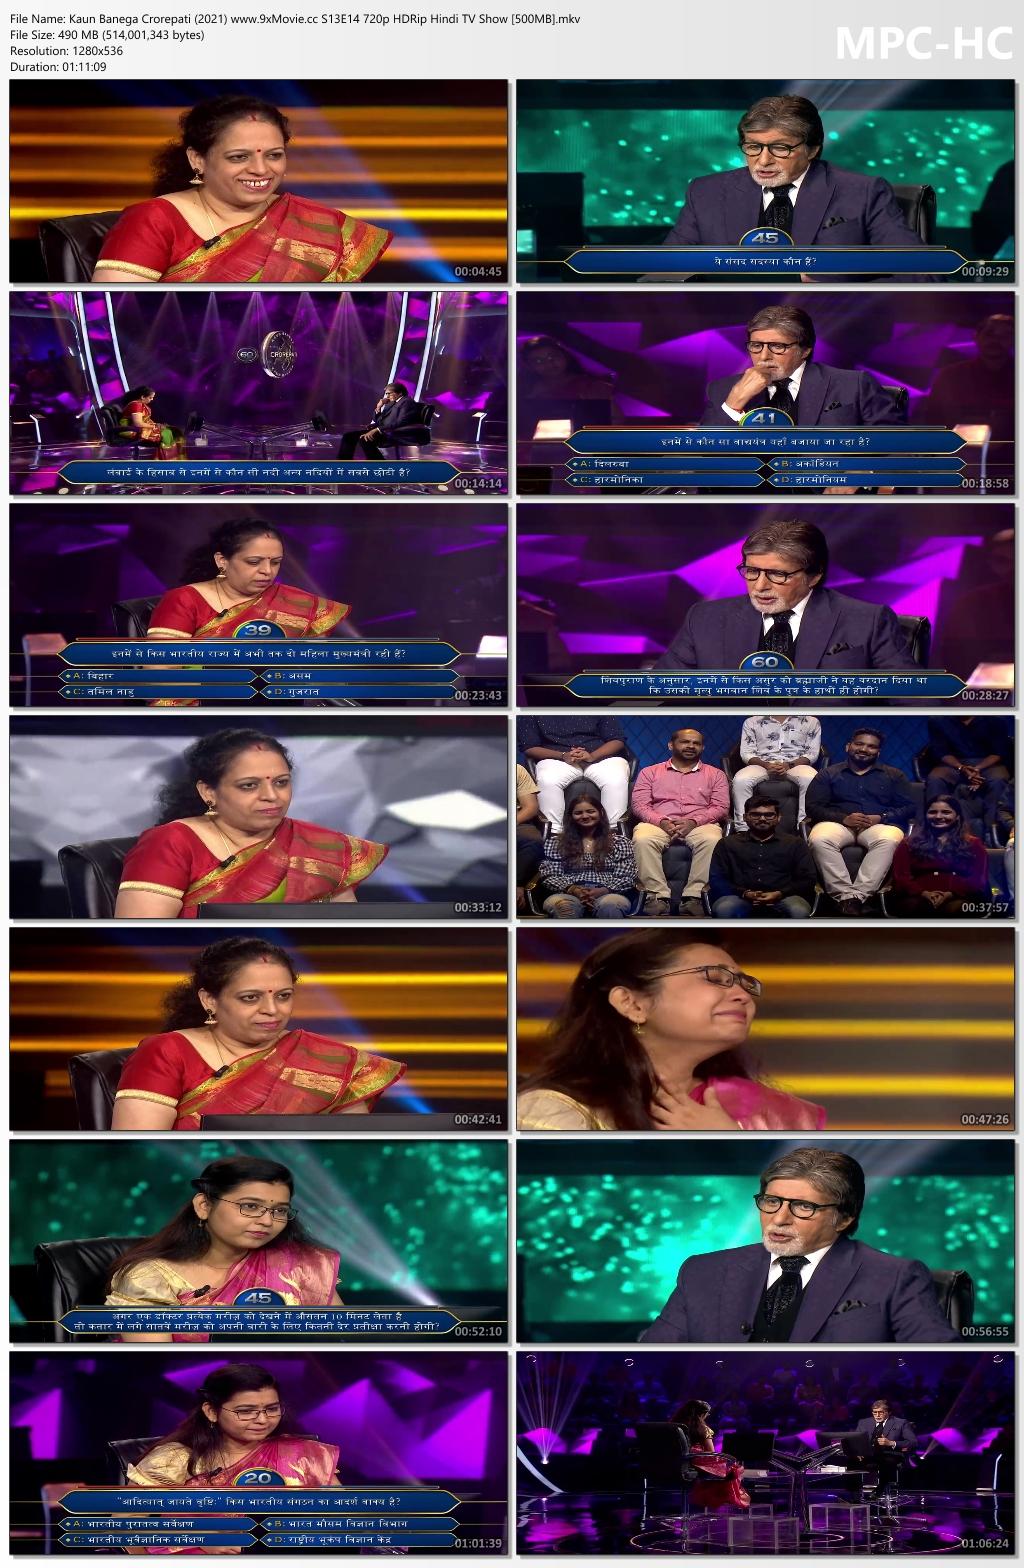 Kaun-Banega-Crorepati-2021-www-9x-Movie-cc-S13-E14-720p-HDRip-Hindi-TV-Show-500-MB-mkv